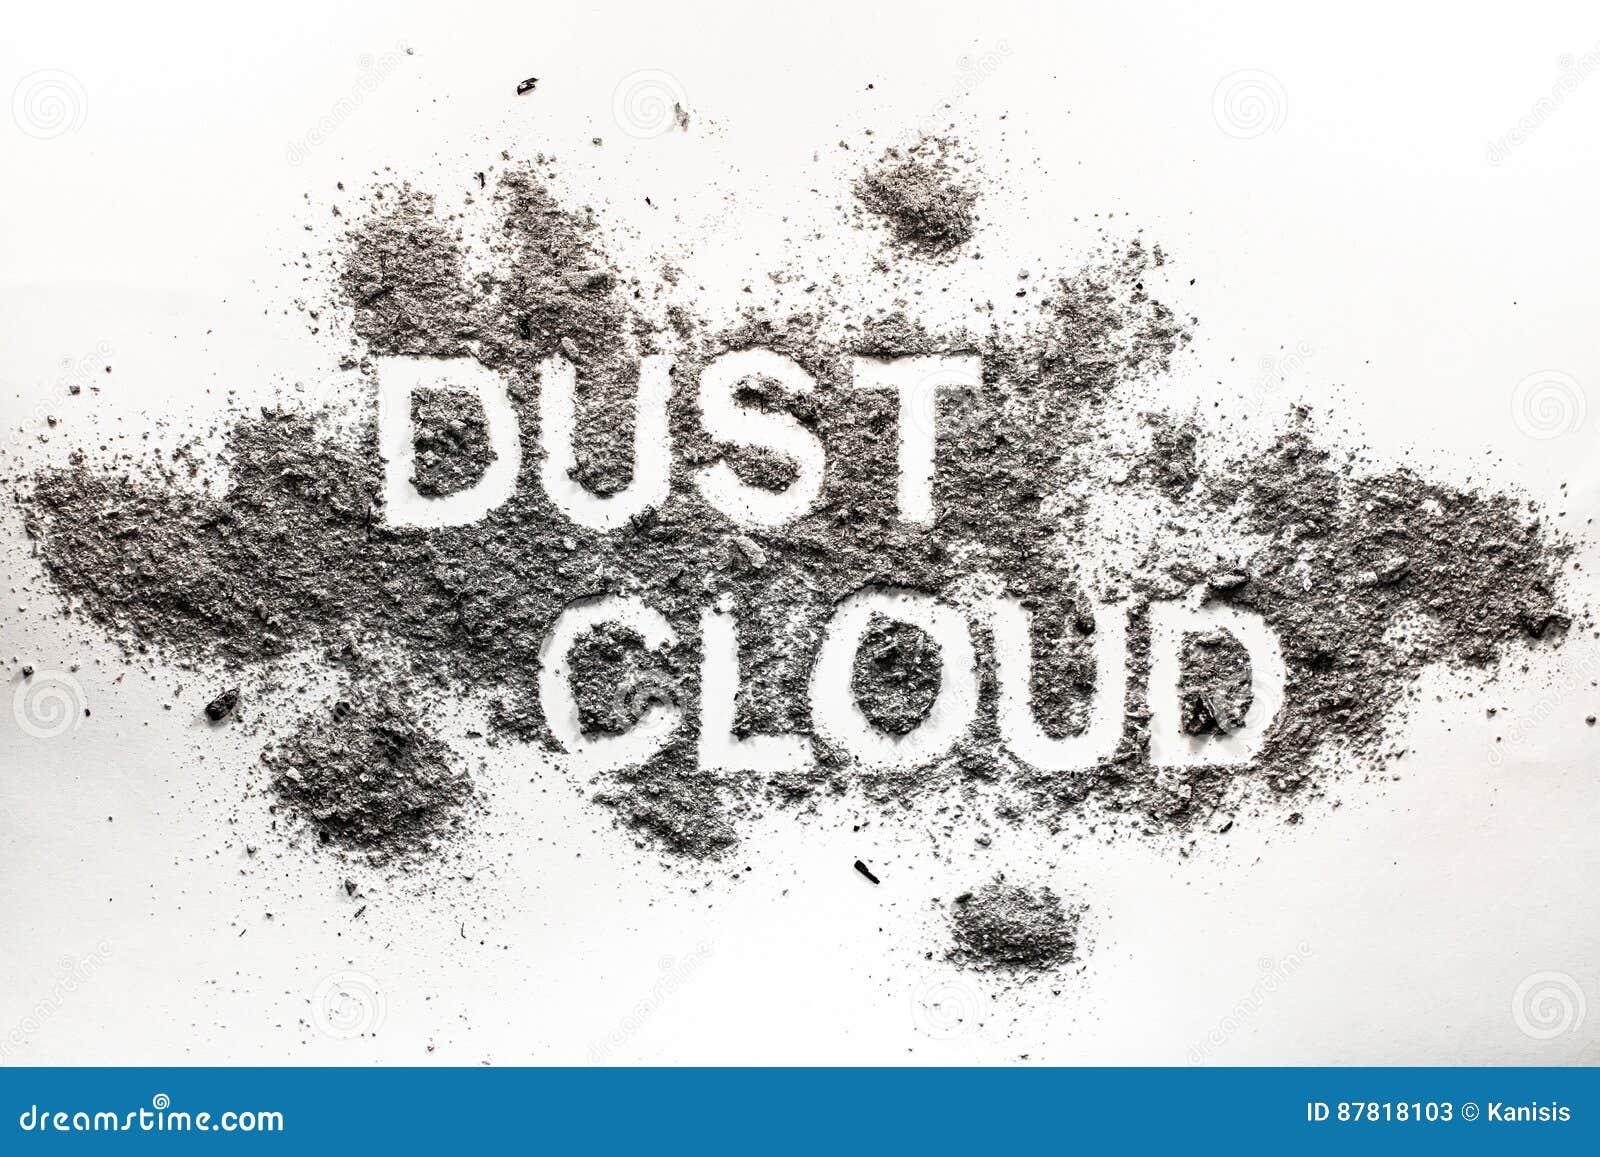 Word dust cloud written in accumulated dust, filth, dirt, ash, s